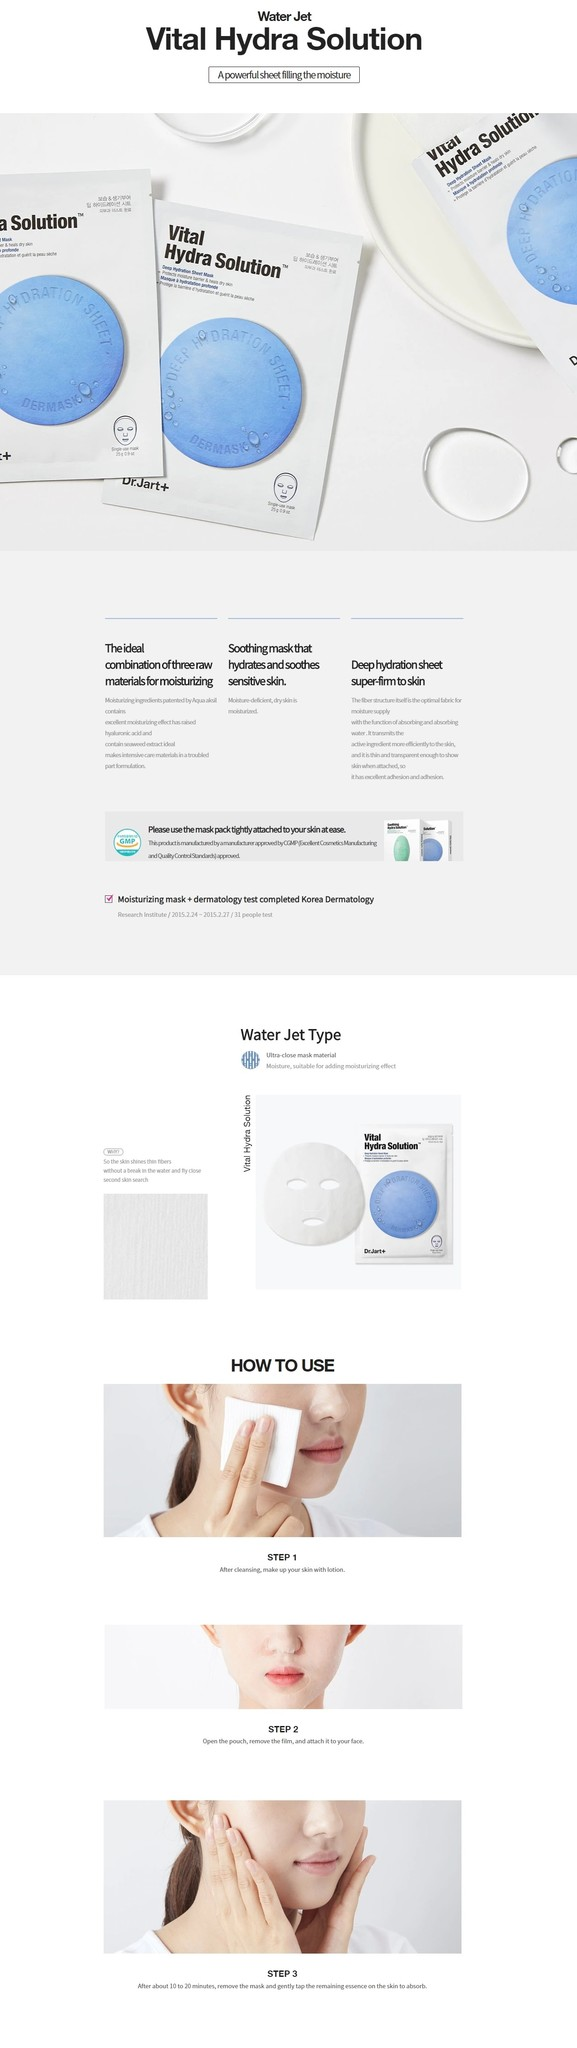 Dermask Water Jet Vital Hydra Solution-3